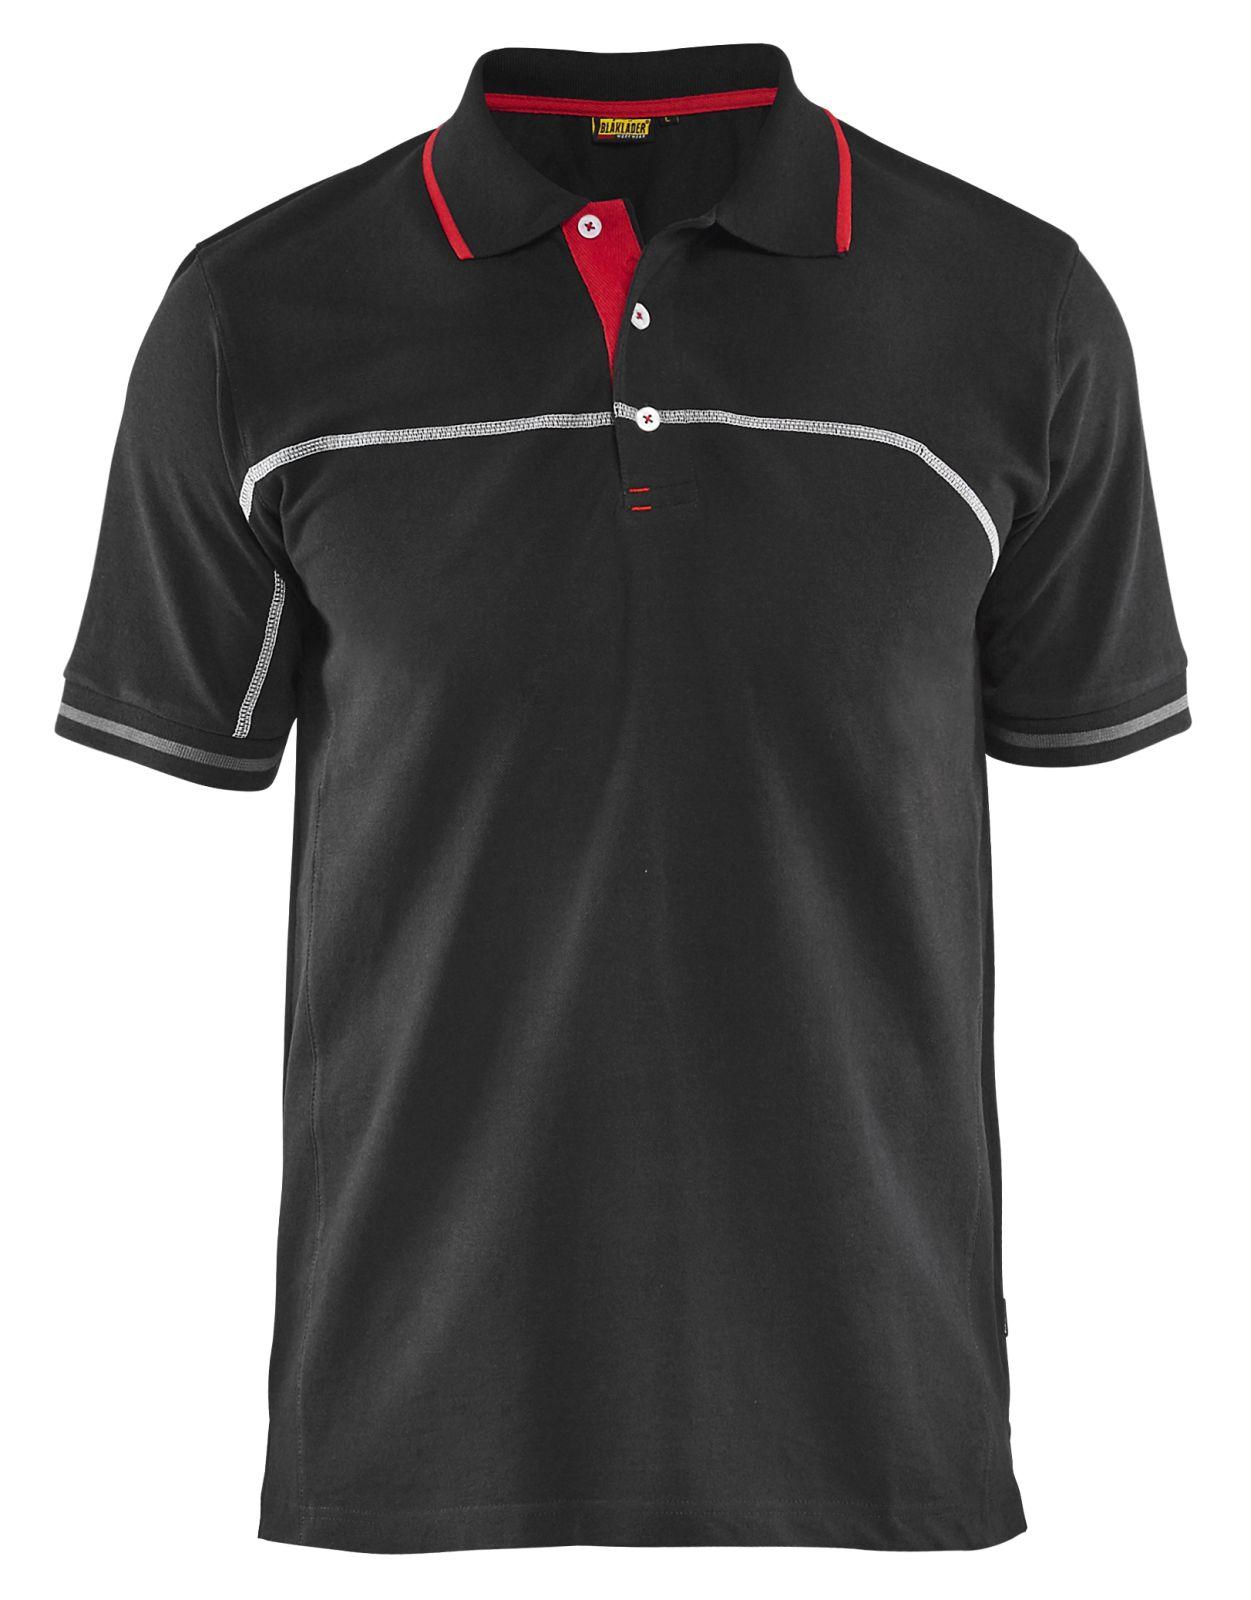 Blaklader Poloshirts 33891050 zwart-rood(9956)